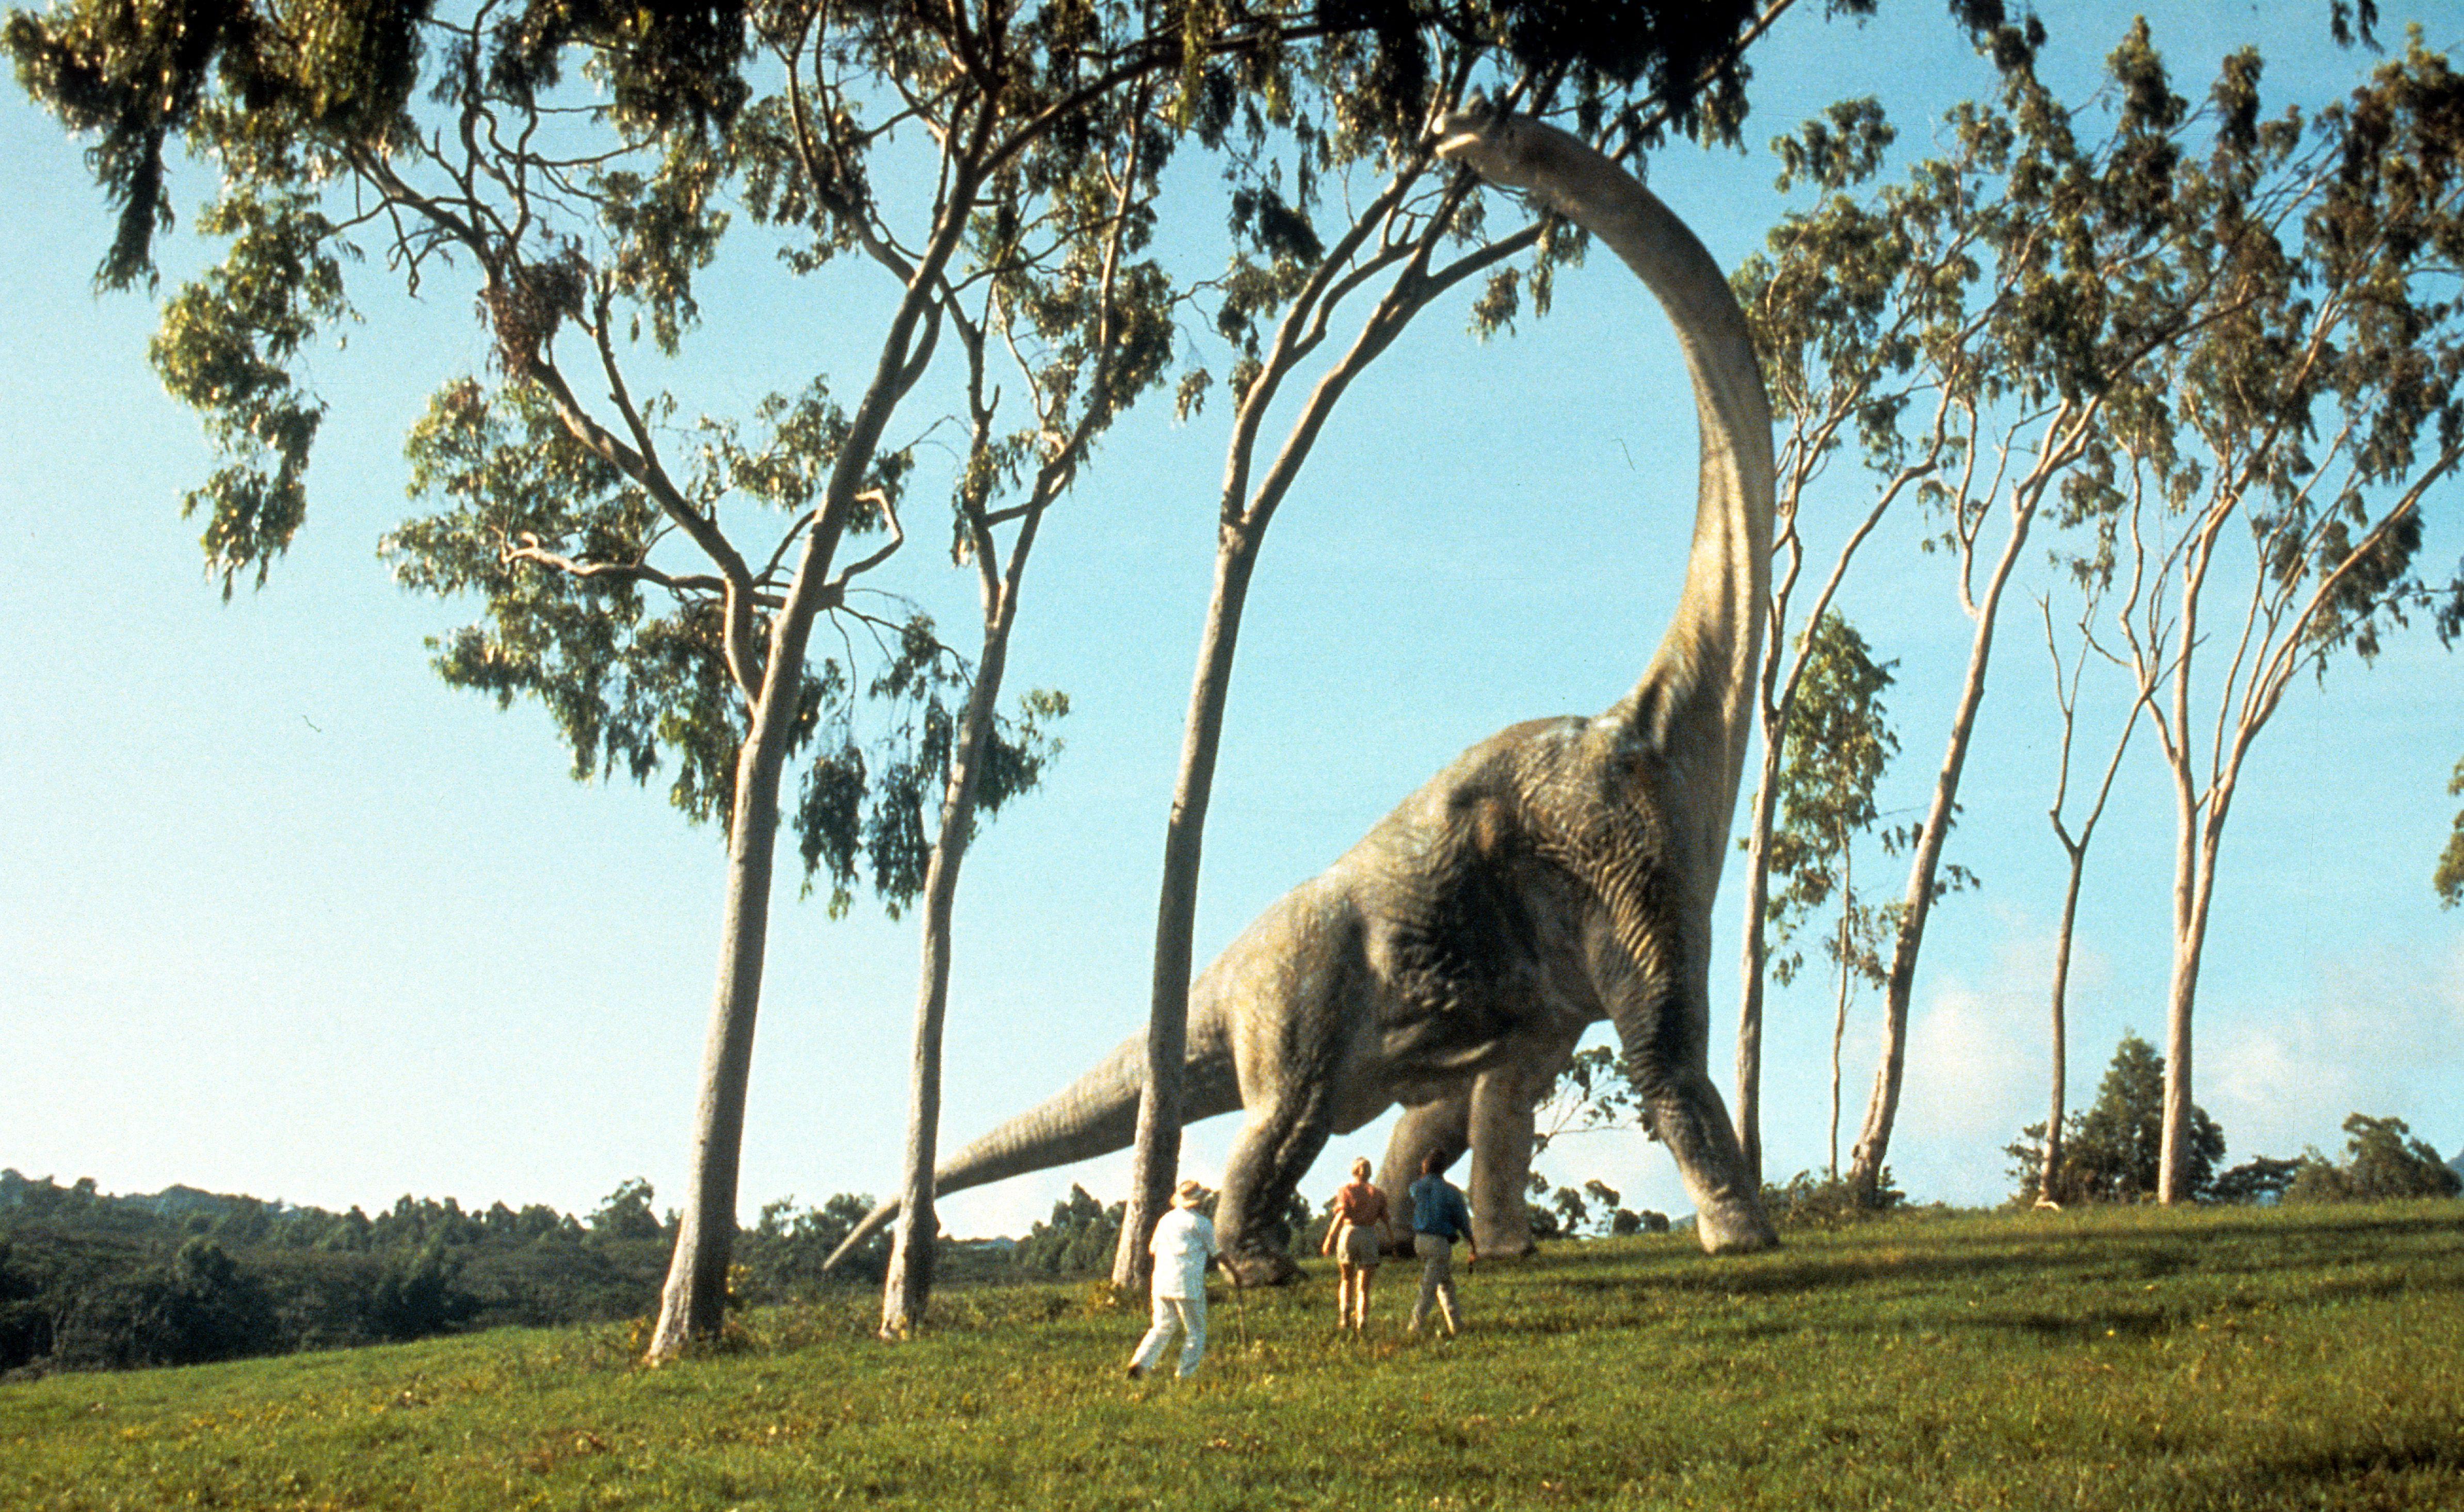 Apatosaurus shot in a movie